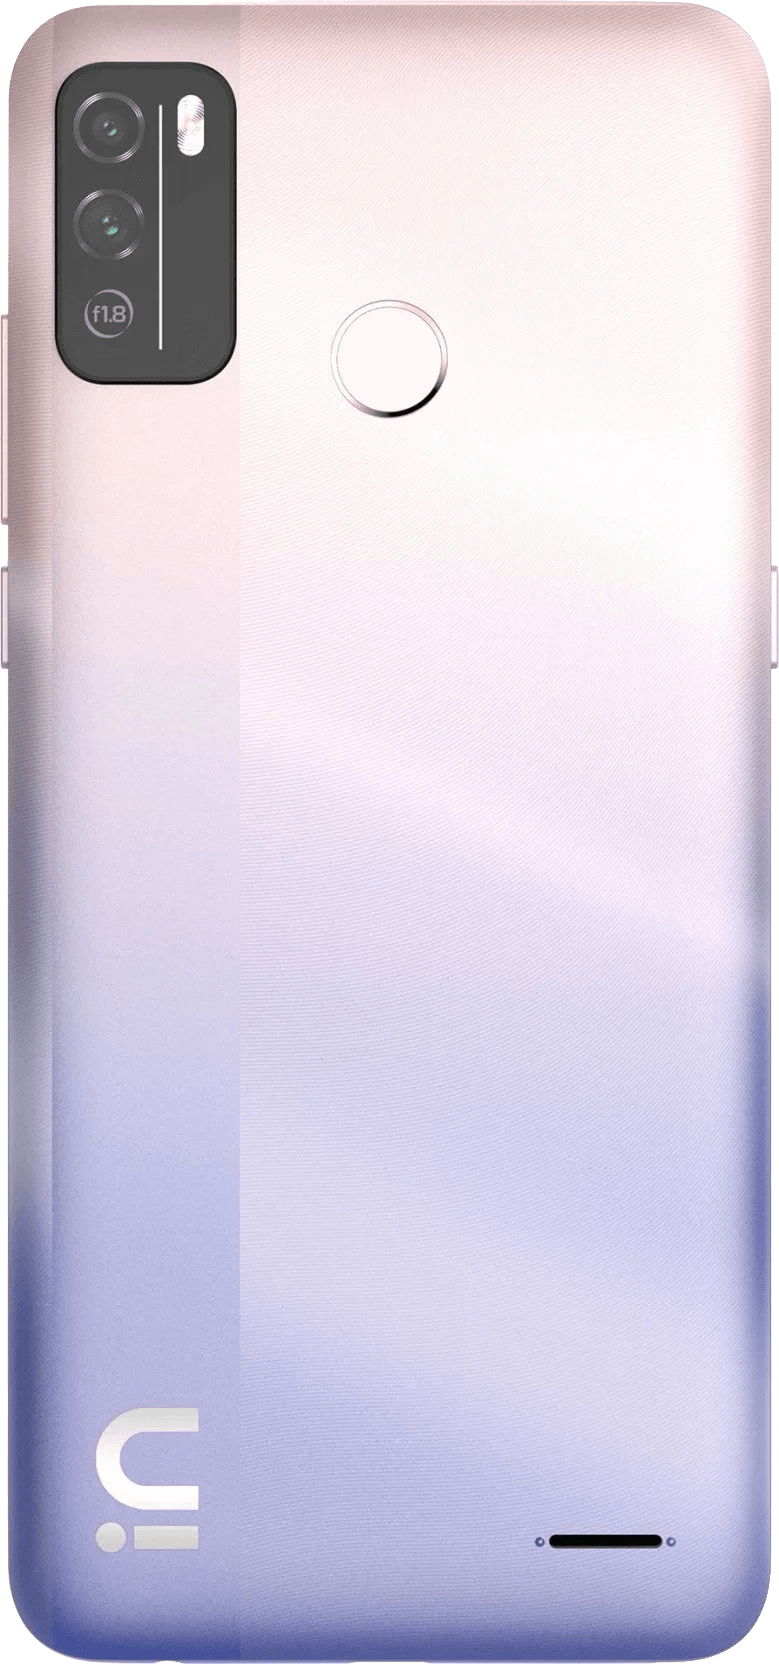 Micromax In 1b